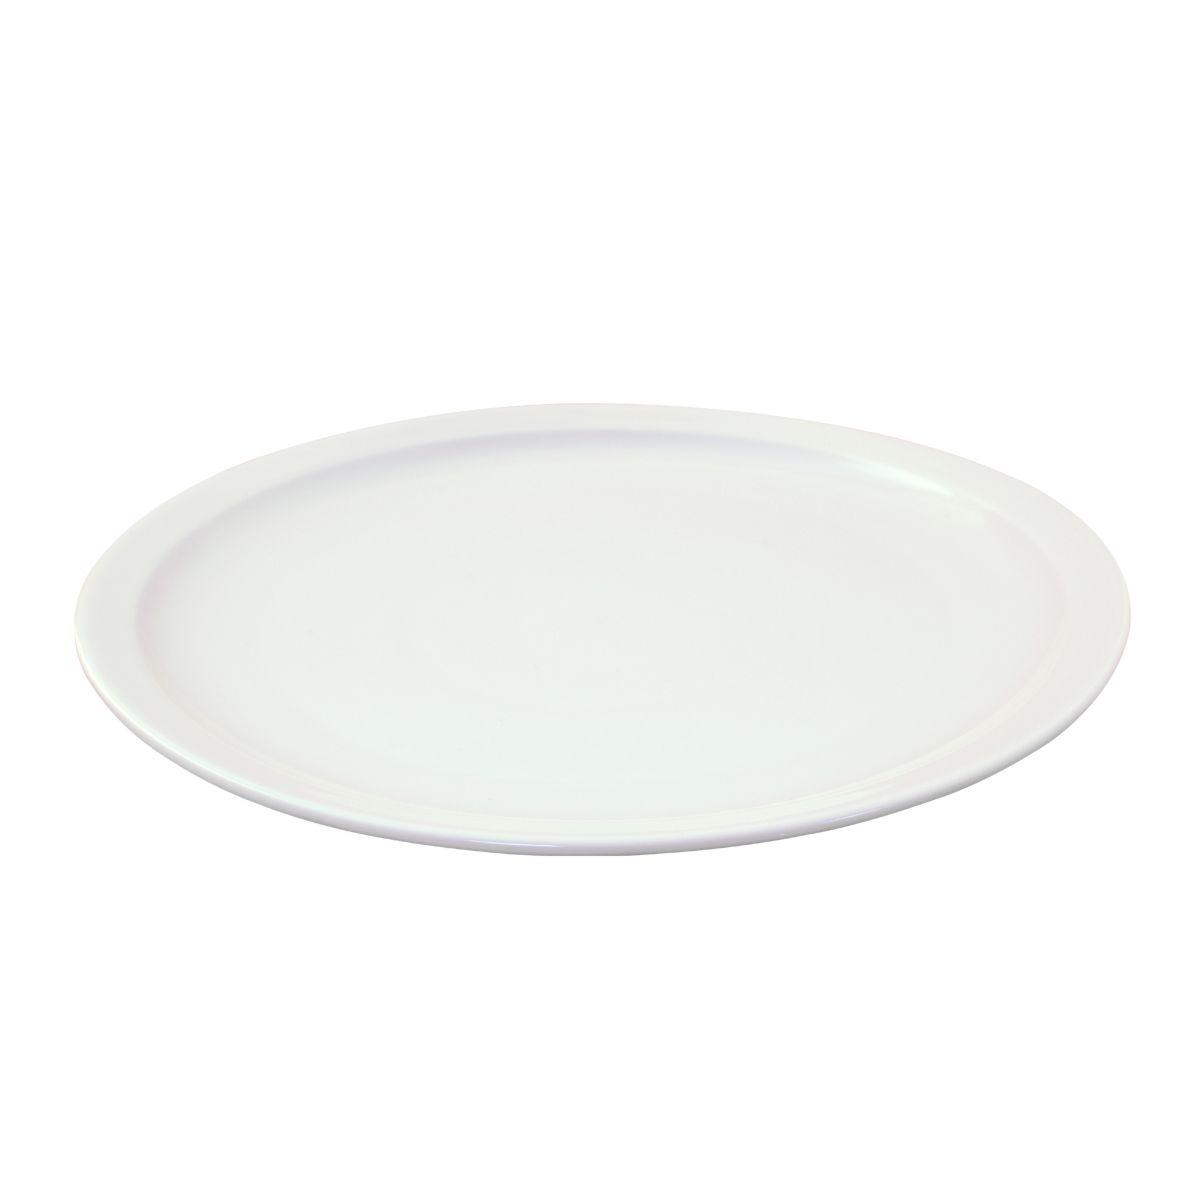 Robert Dyas White Pizza Plate - 30cm